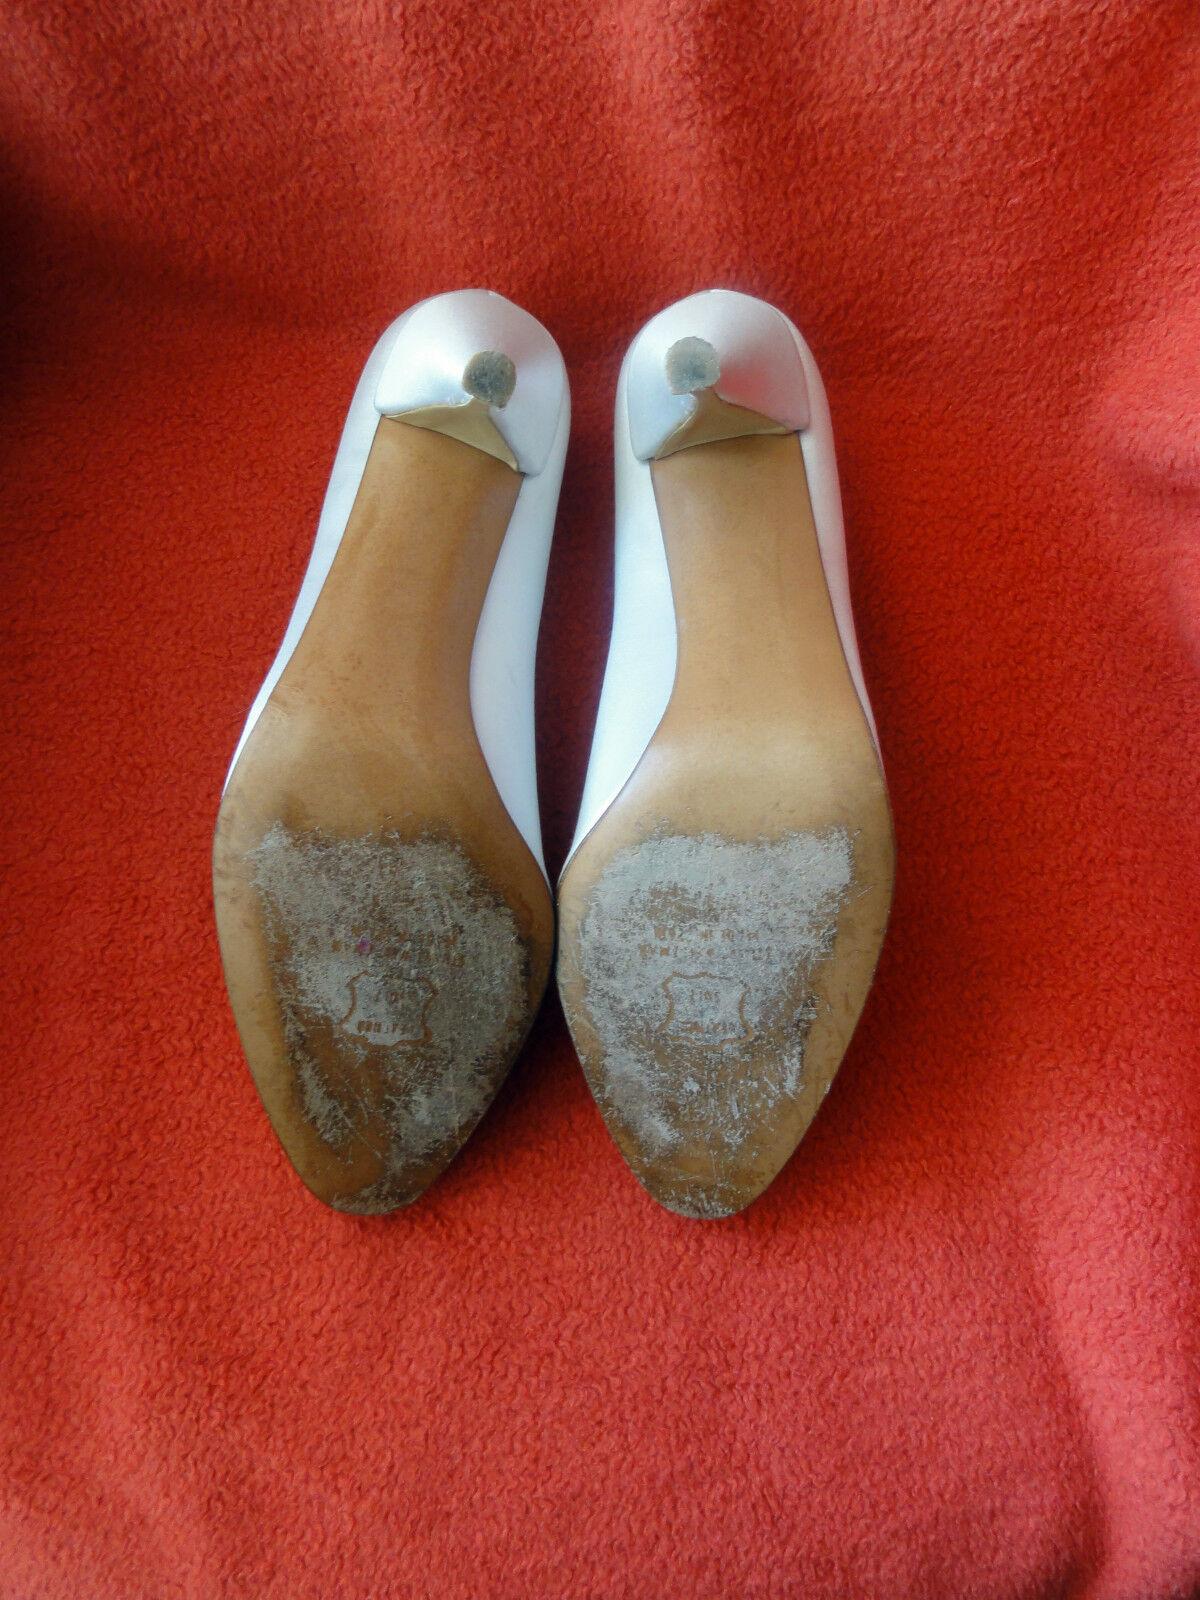 Stuart Weitzman festliche Schuhe Pumps,High 37 Heels - TOP Gr.ca. 37 Pumps,High -7,5 M in Weiß 4e09ce